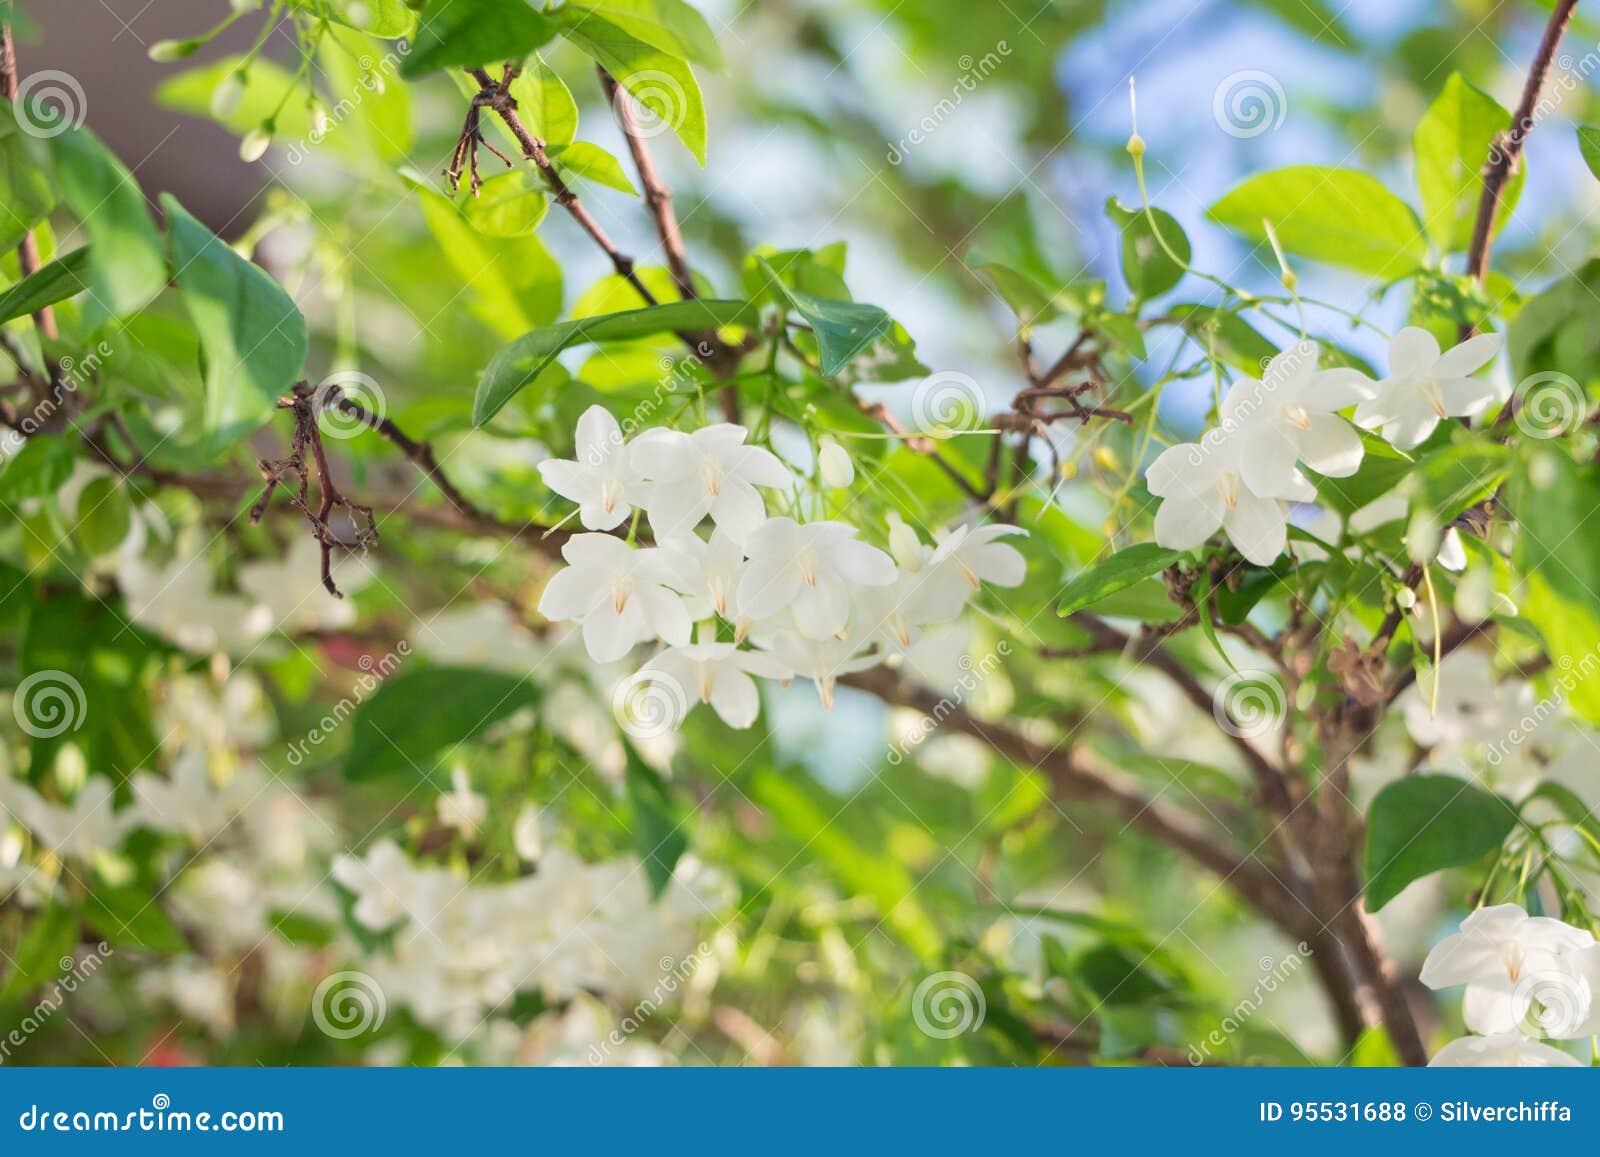 Fleur Tropicale Blanche Wrightia Religiosa Benth Photo Stock Image